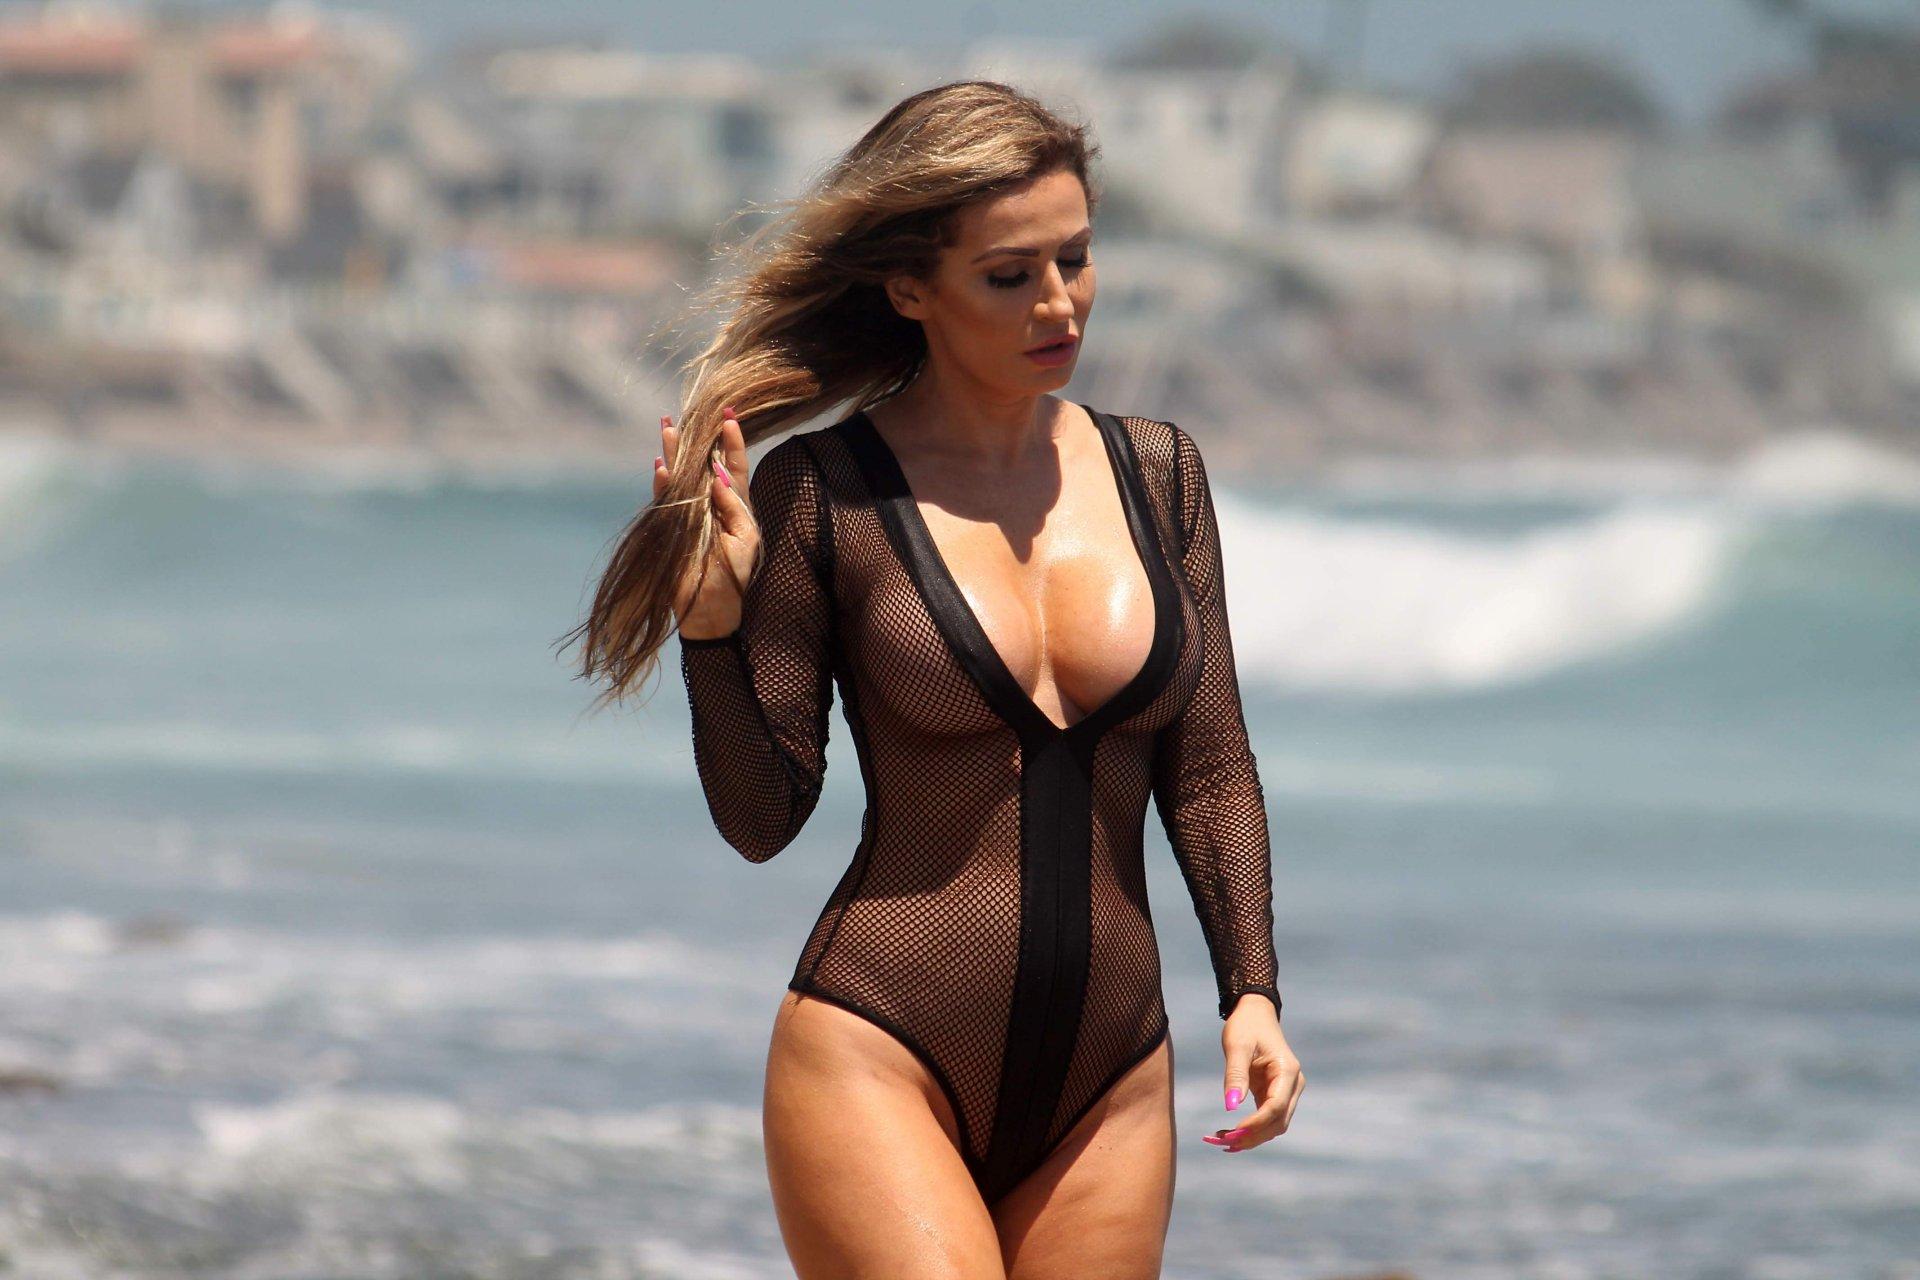 Selfie Swimsuit Roxane Mesquida  nudes (14 pics), iCloud, butt